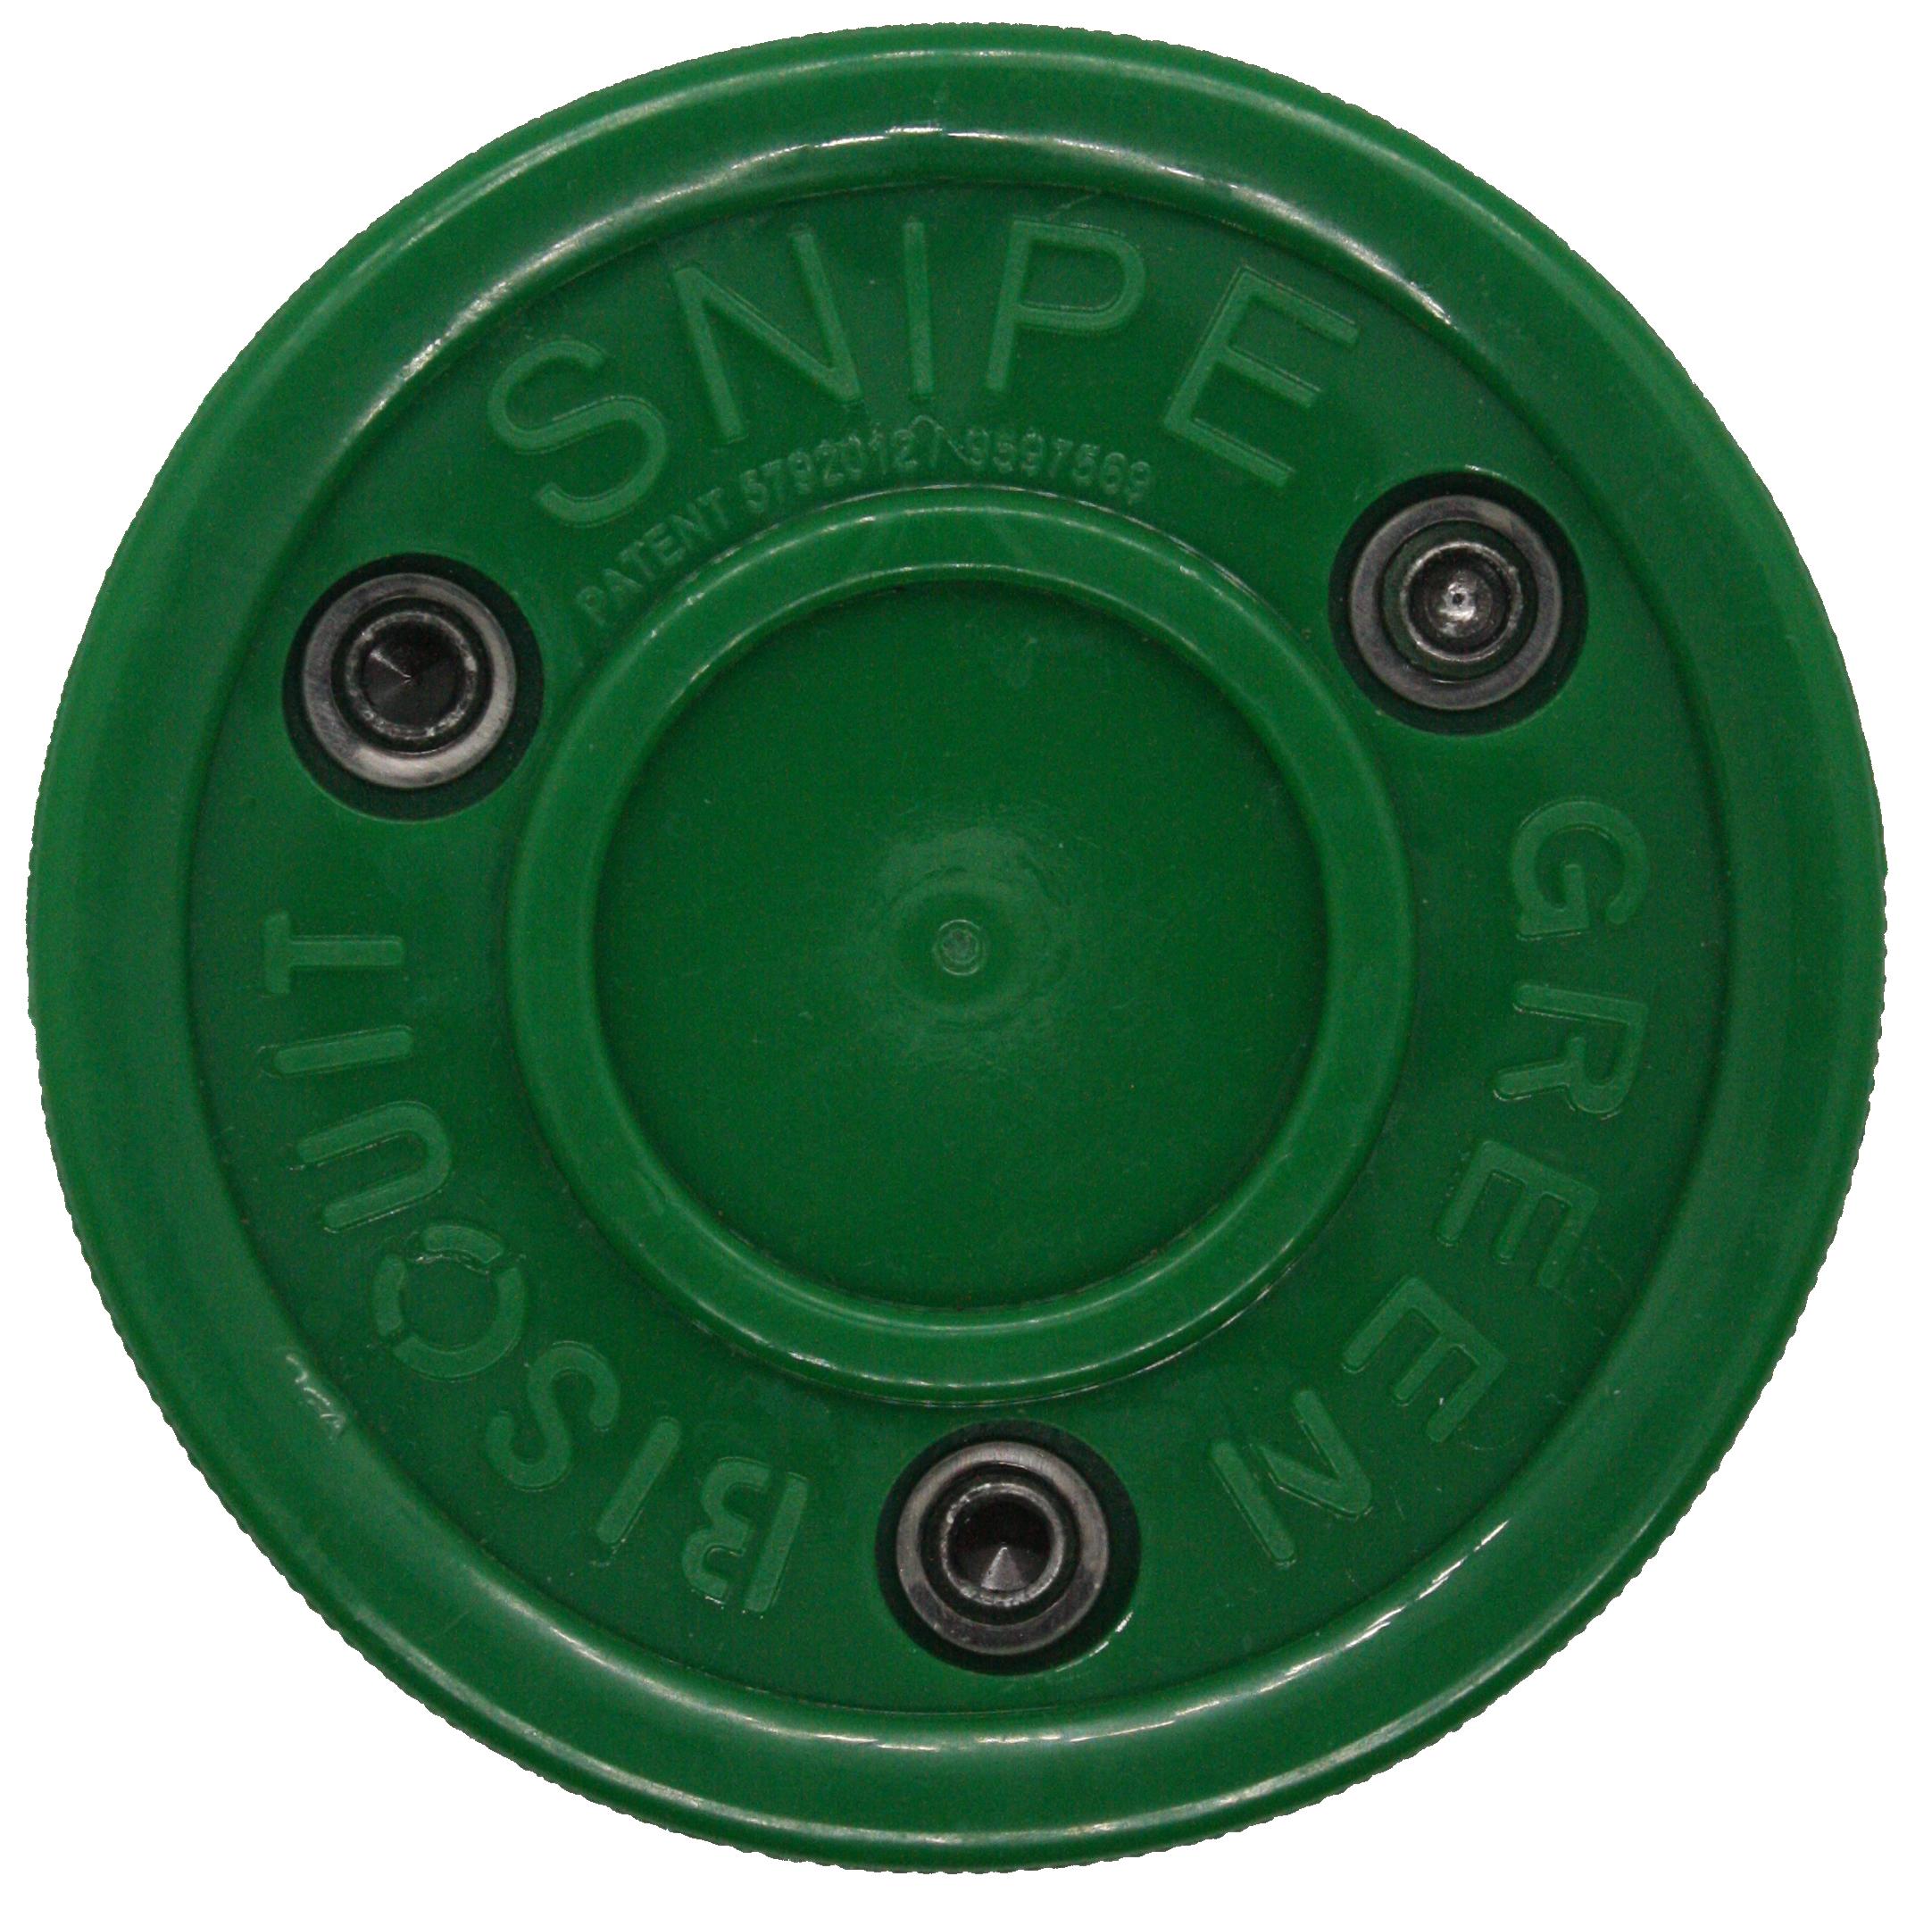 Green Biscuit Snipe Shooting Stick Handling Training Street Hockey Puck